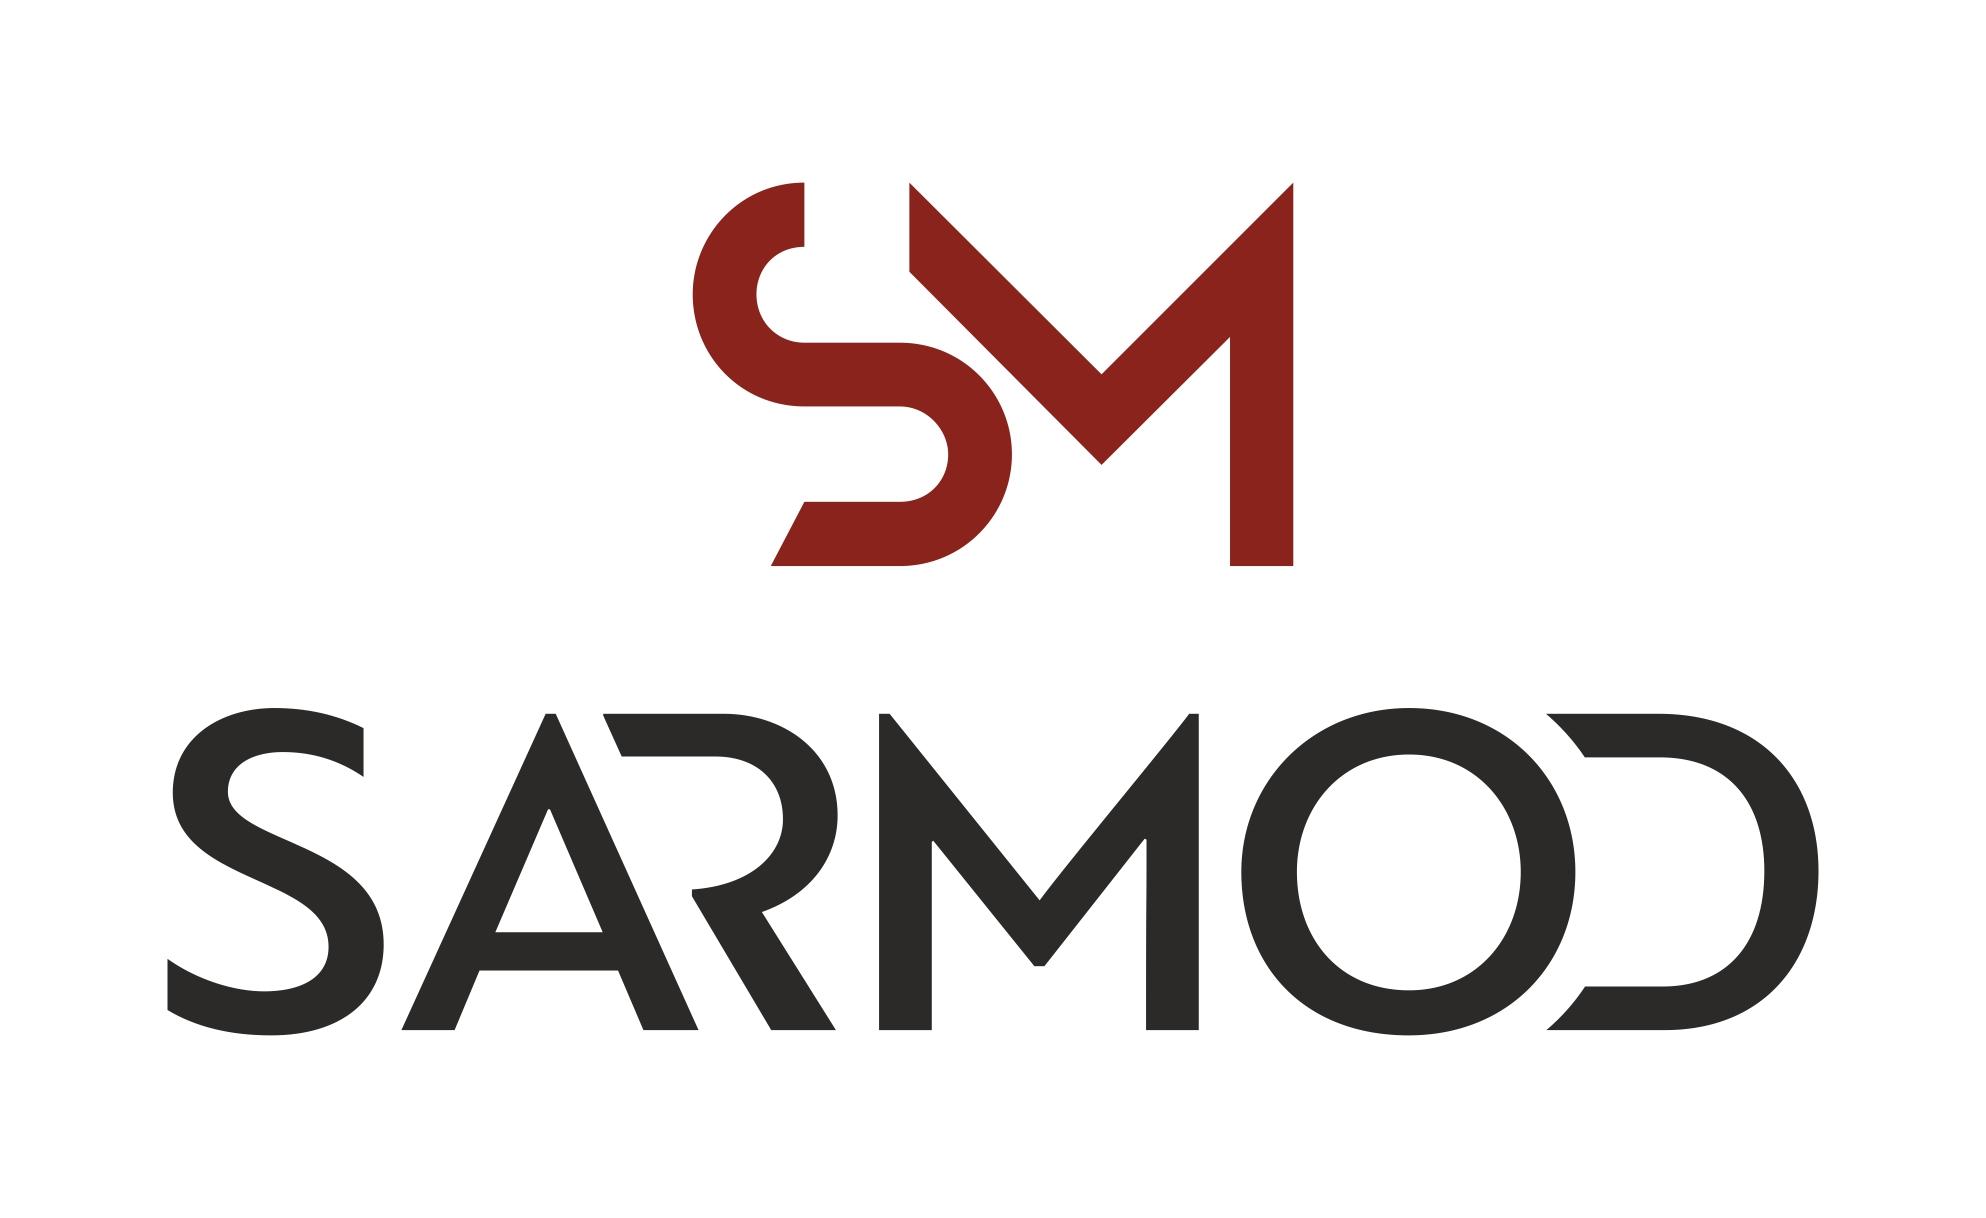 SARMOD GIYIM LTD. STI.